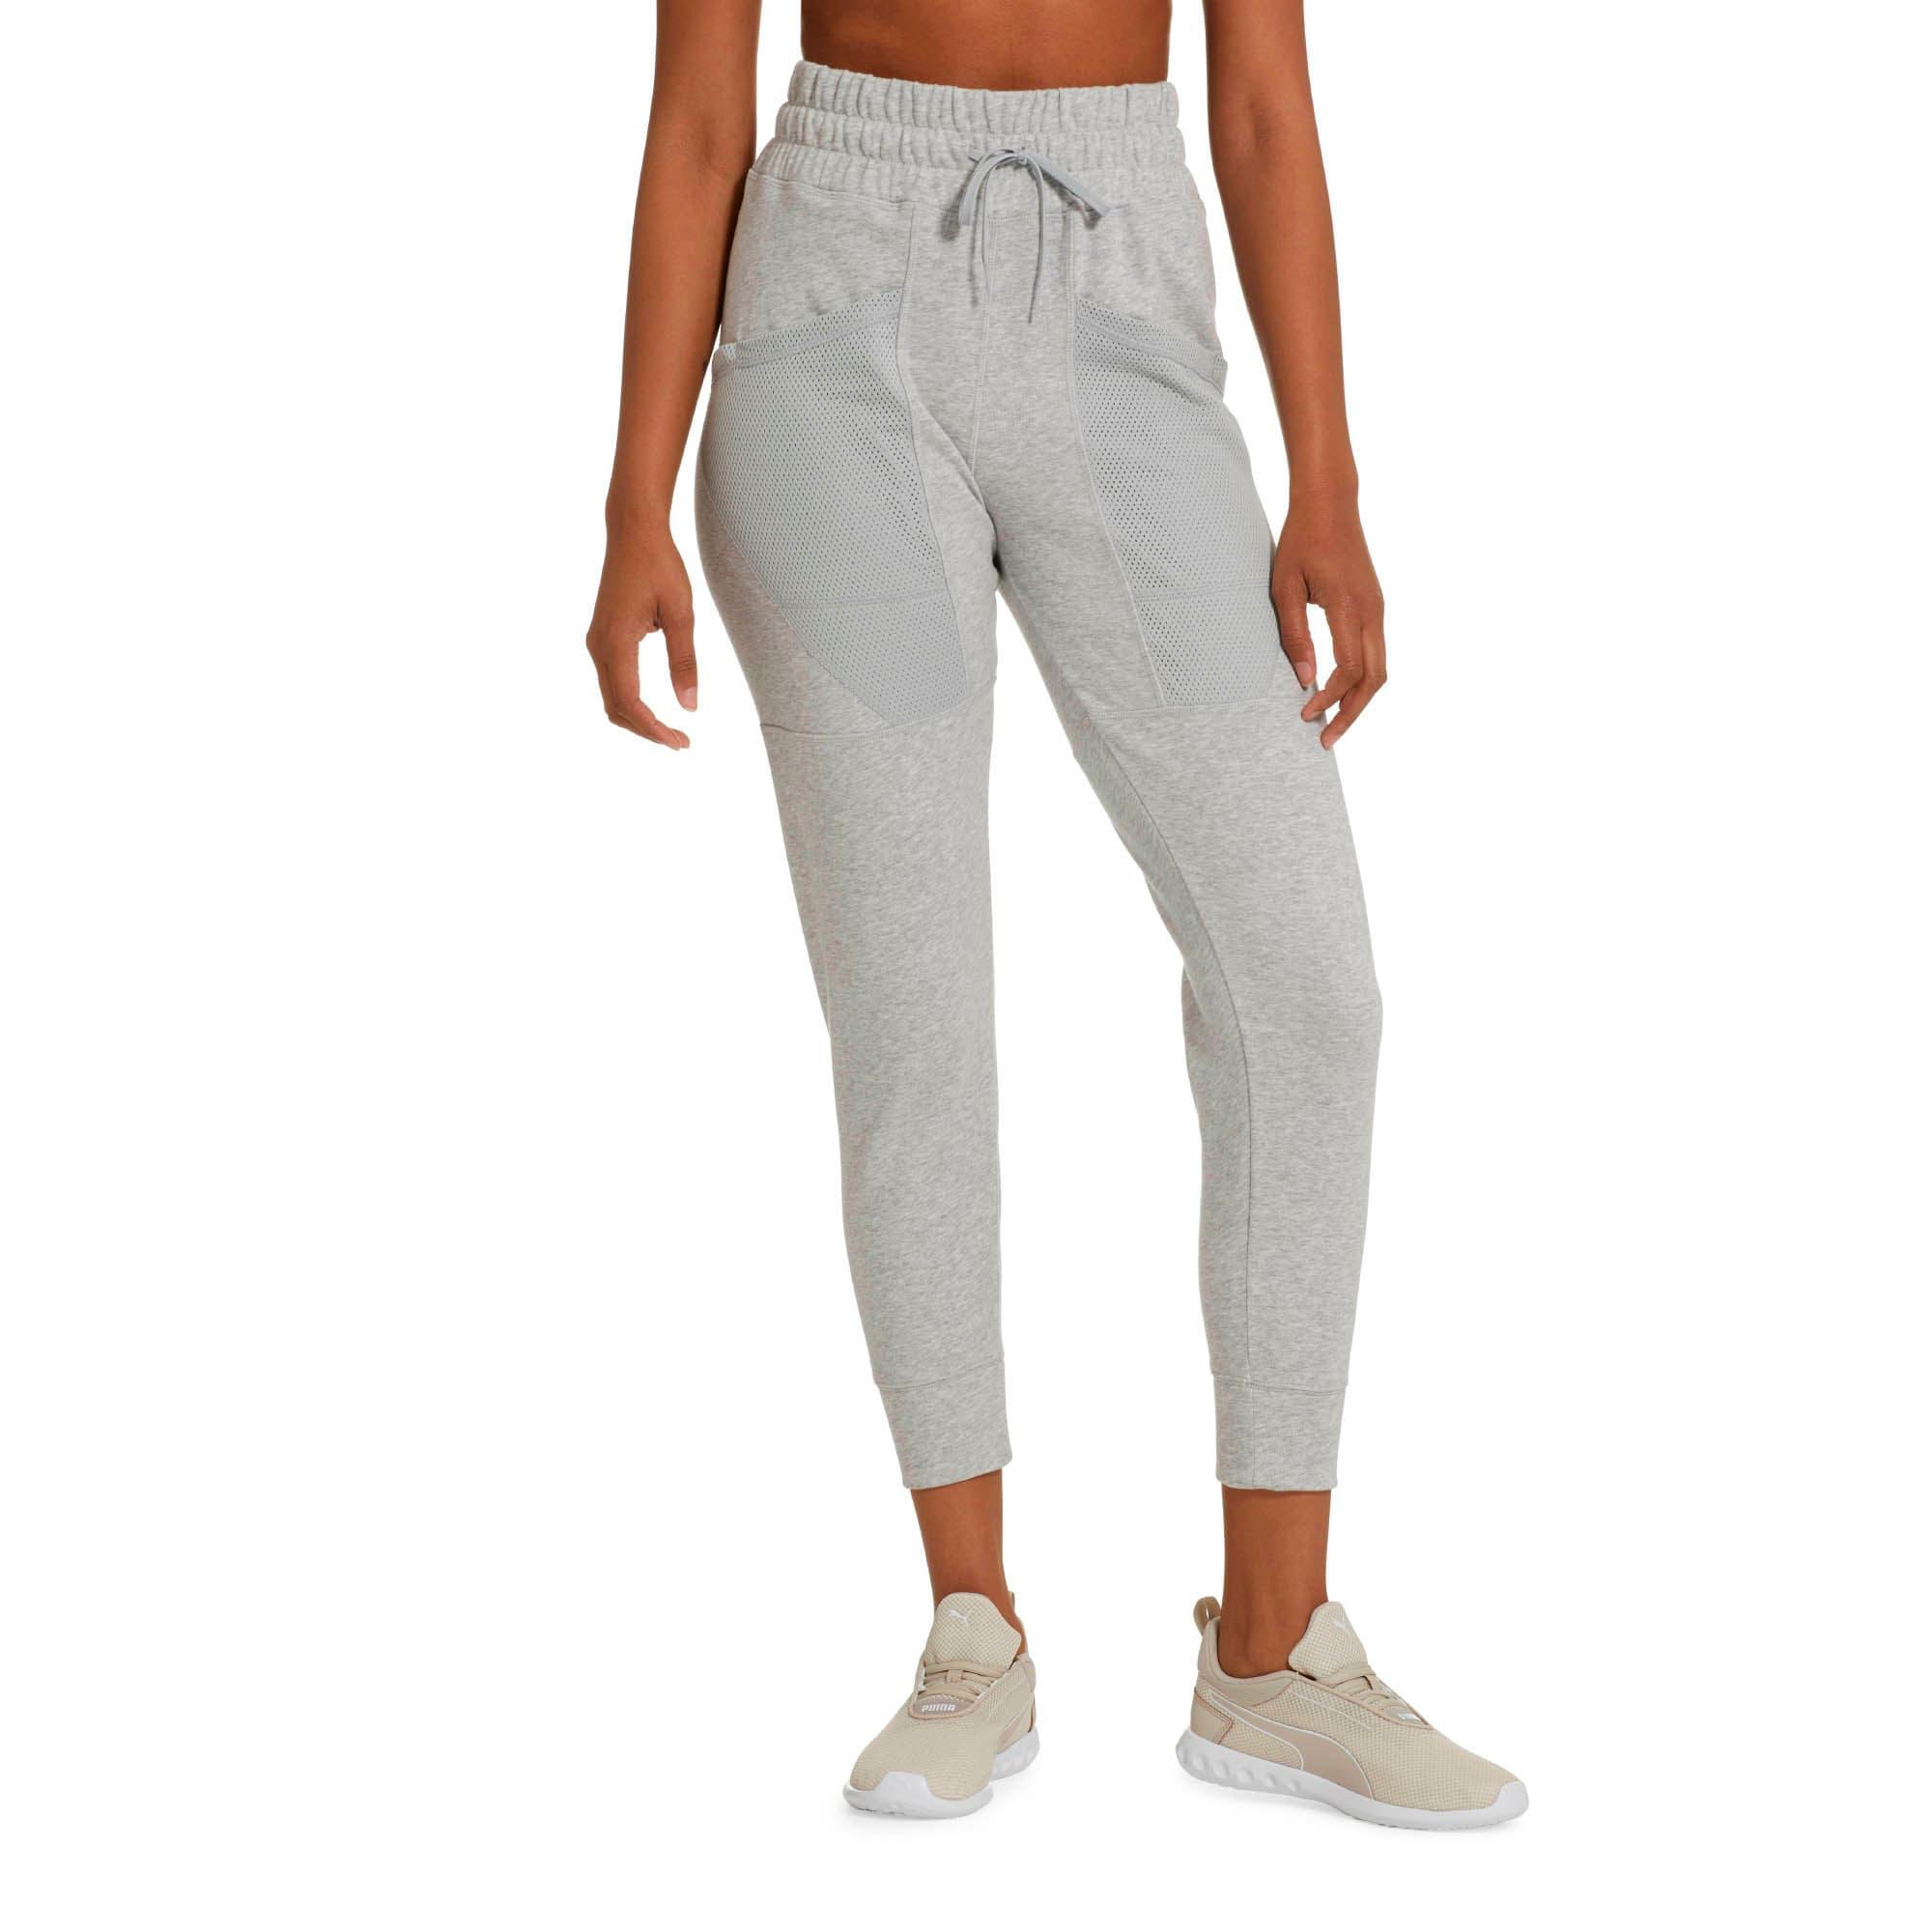 Thumbnail 1 of Yogini Women's 7/8 Pants, Light Gray Heather, medium